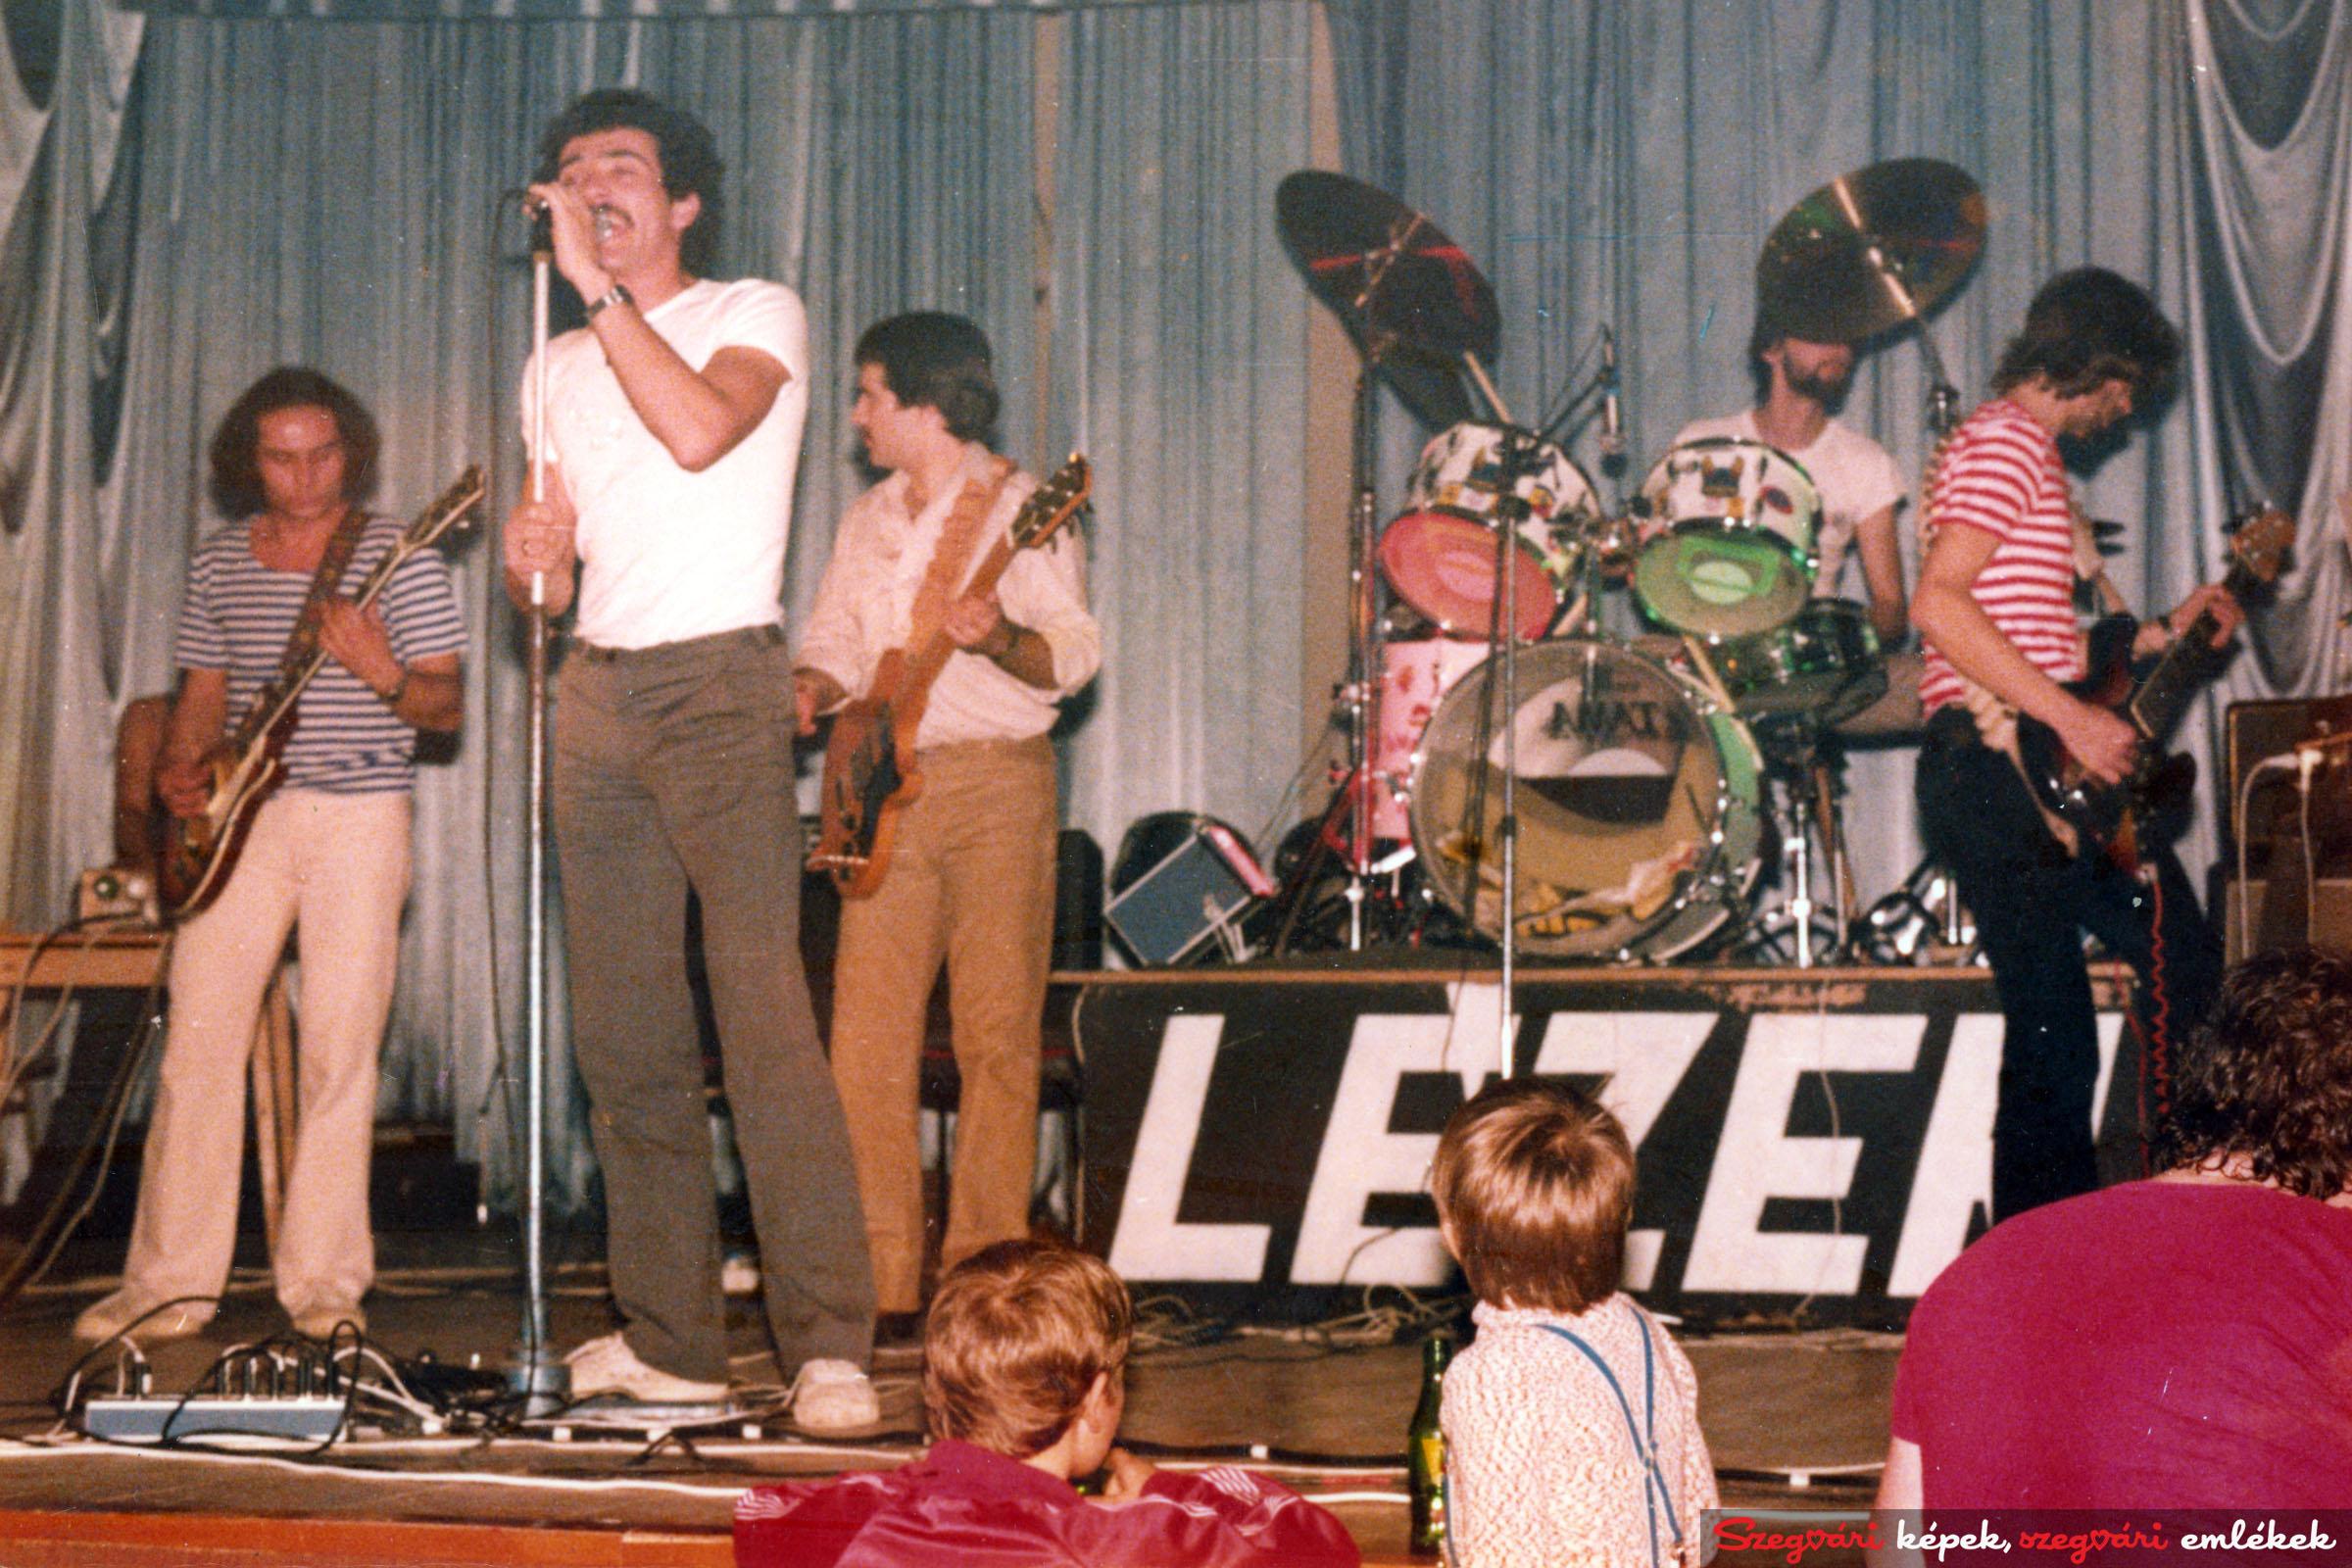 061 Lézer Rock 1980-1983. 004 – Fekete tulipántól a Lézerig,